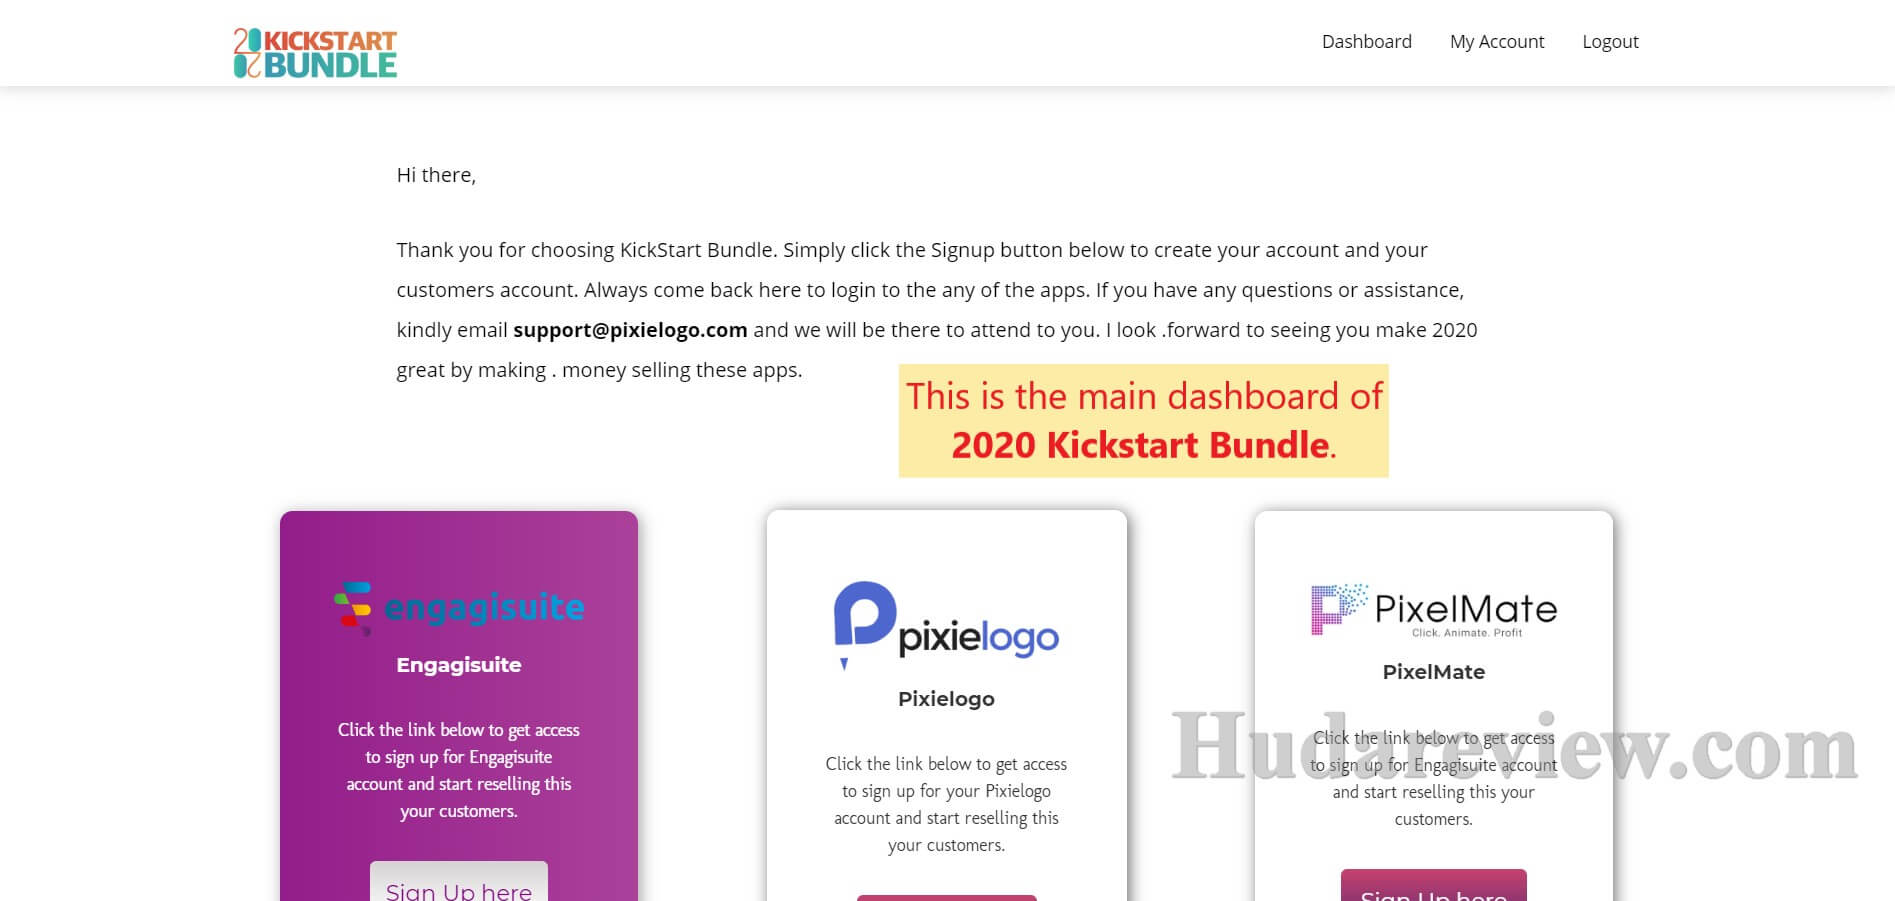 2020-KickStart-Bundle-Step-1-2